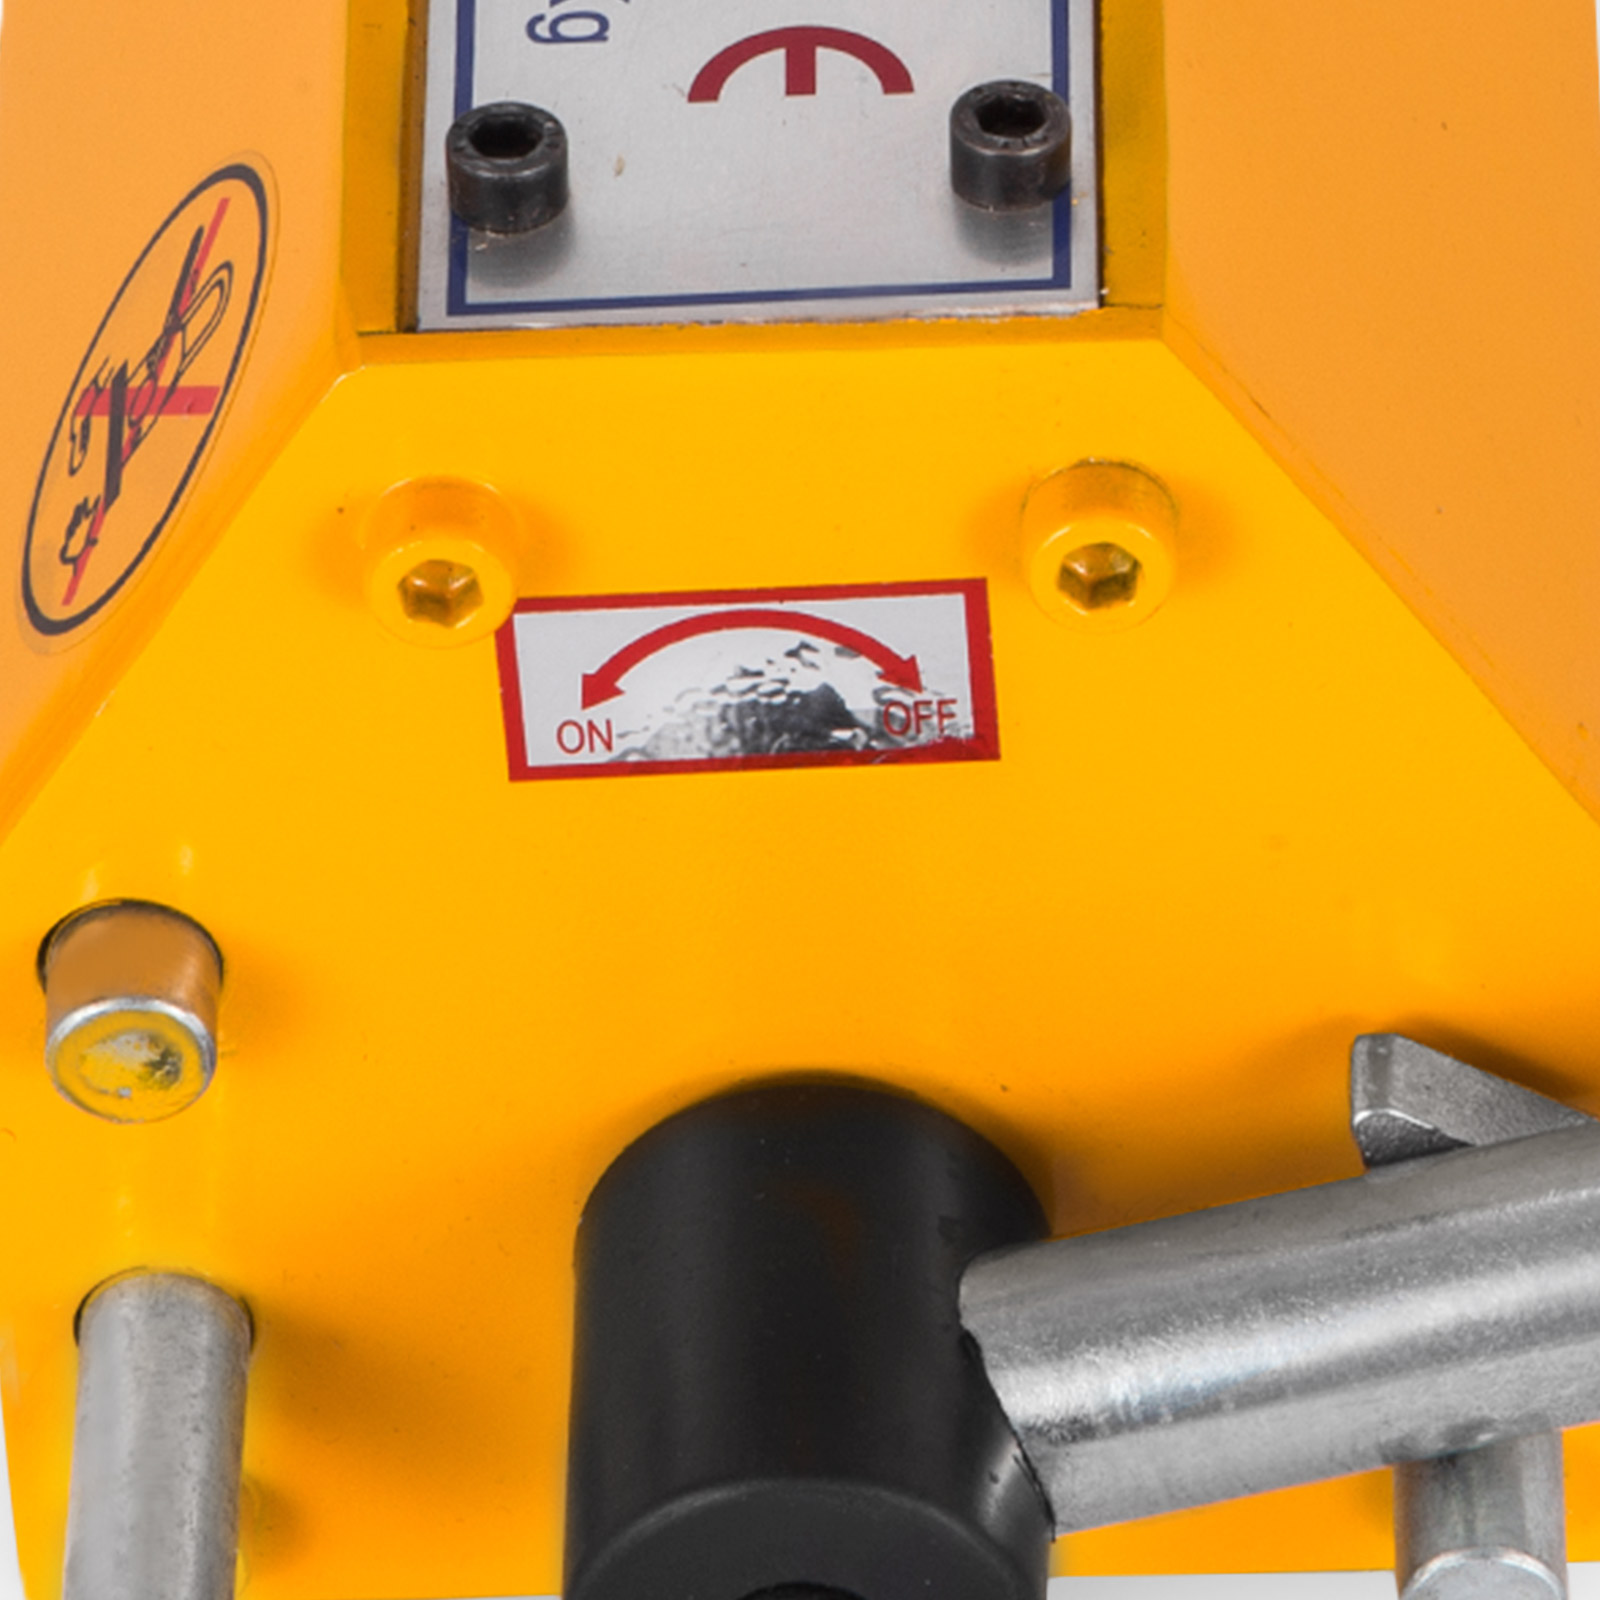 100-300-600-1000KG-Steel-Magnetic-Lifter-Heavy-Duty-Crane-Hoist-Lifting-Magnet miniature 84